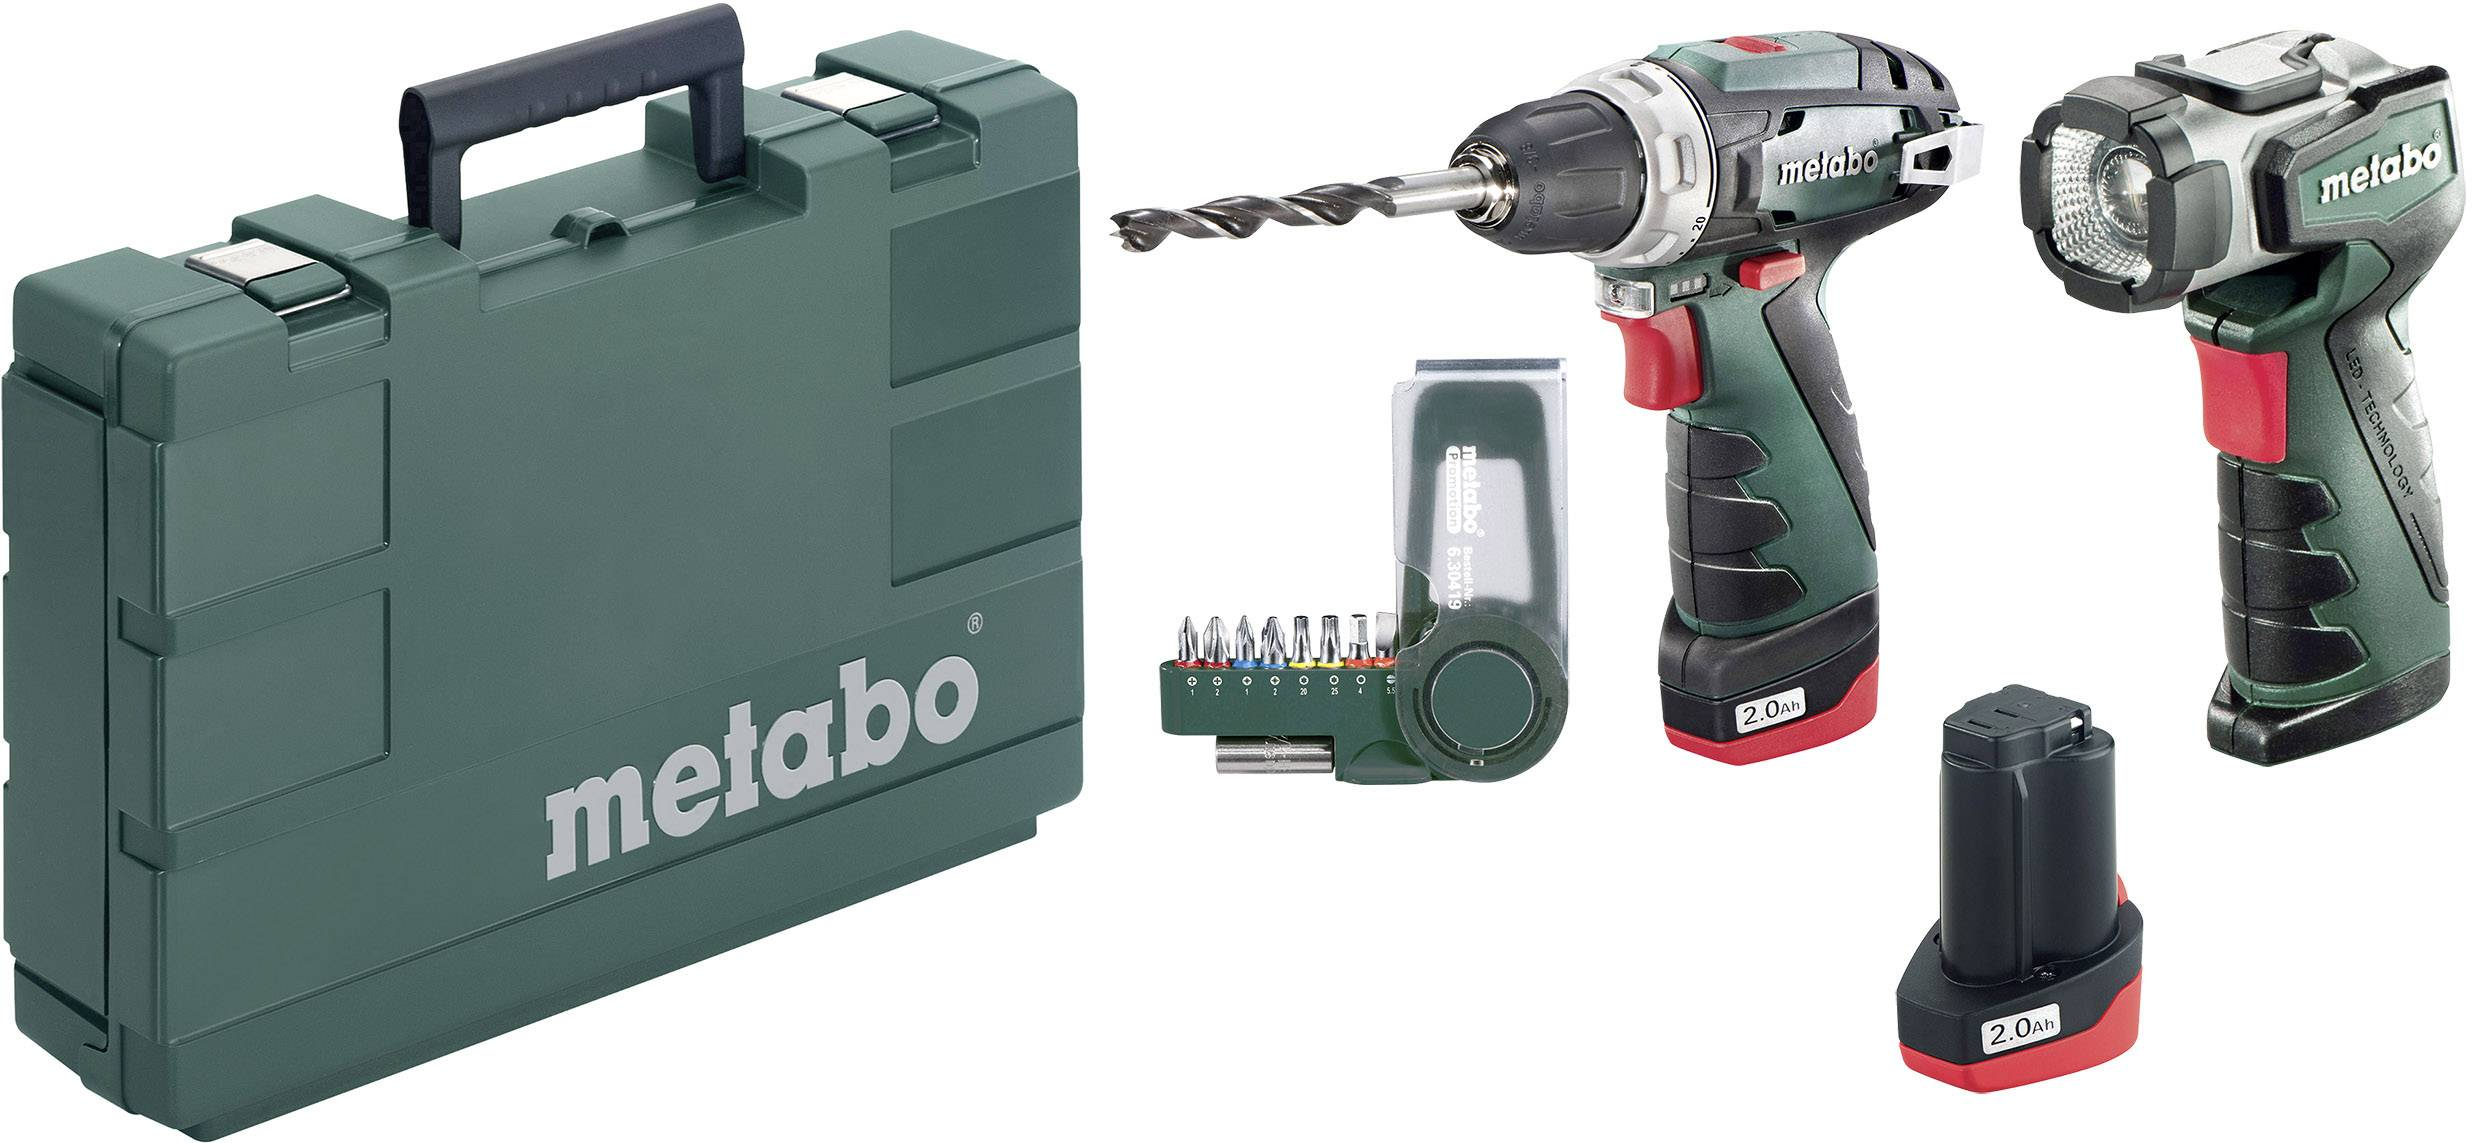 Aku vŕtací skrutkovač Metabo PowerMaxx BS Basic Set 600080530, 10.8 V, 2 Ah, Li-Ion akumulátor